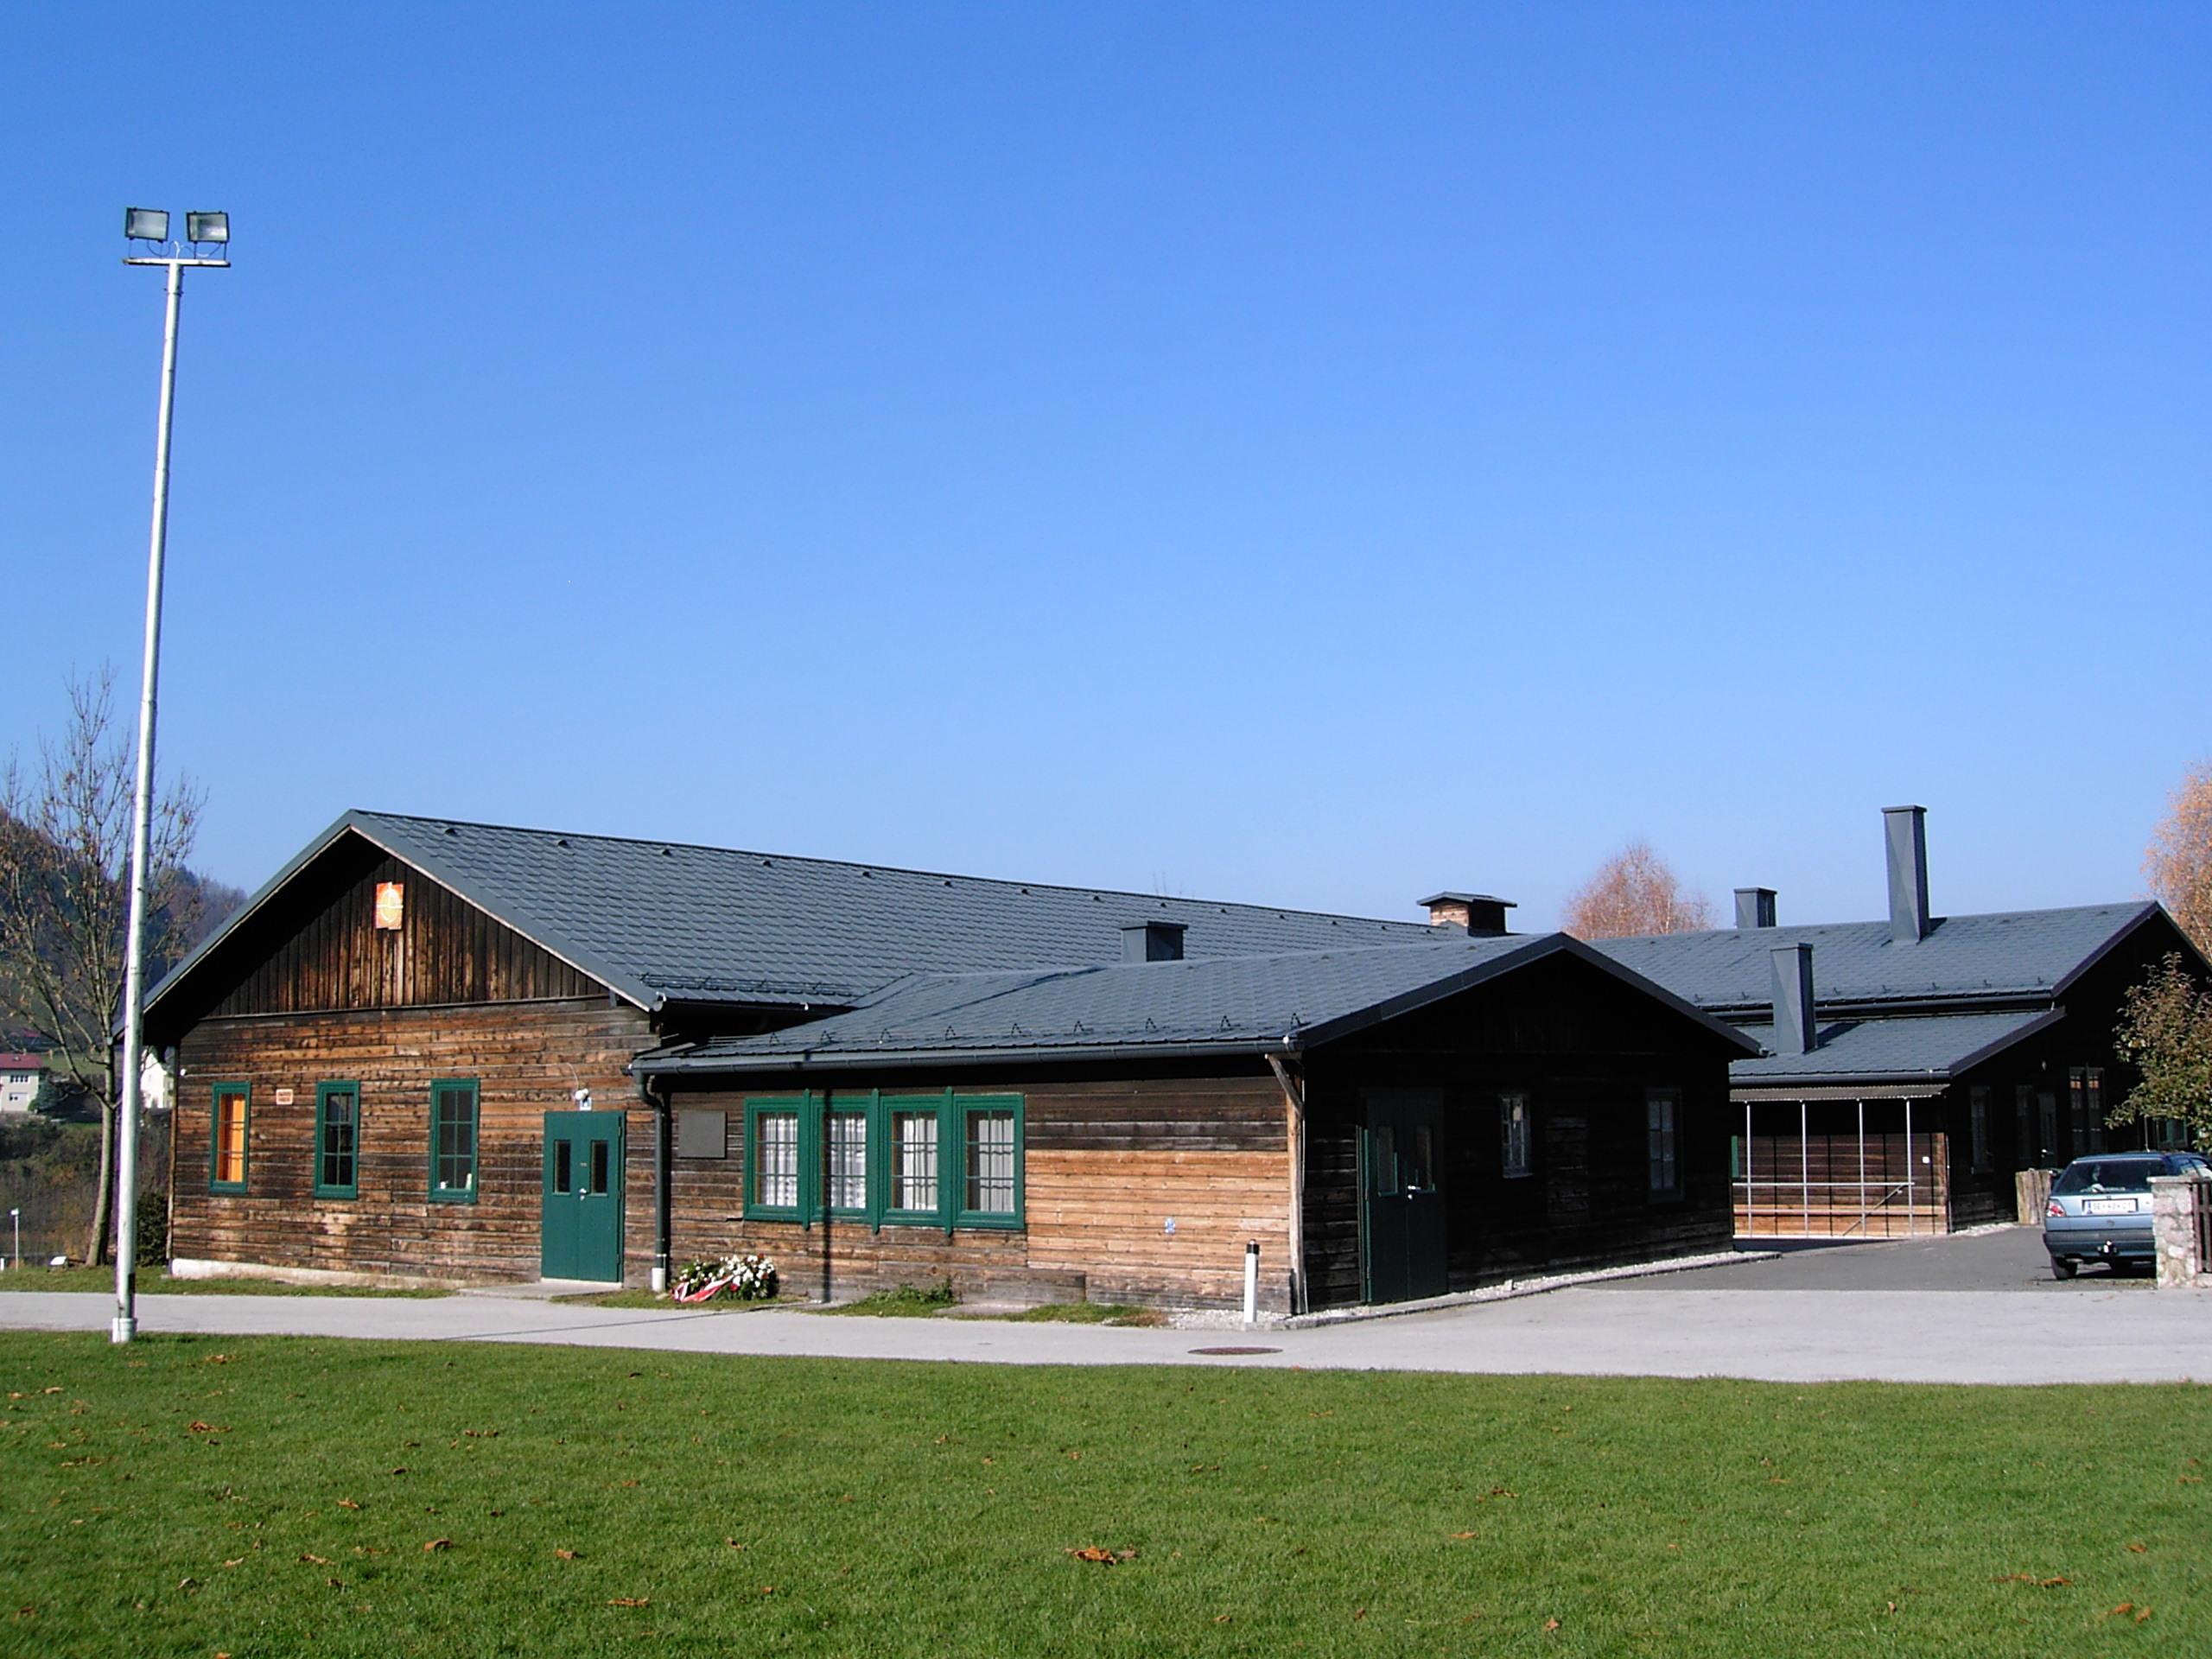 Jugendzentrum Ternberg - Ternberg - RiS-Kommunal